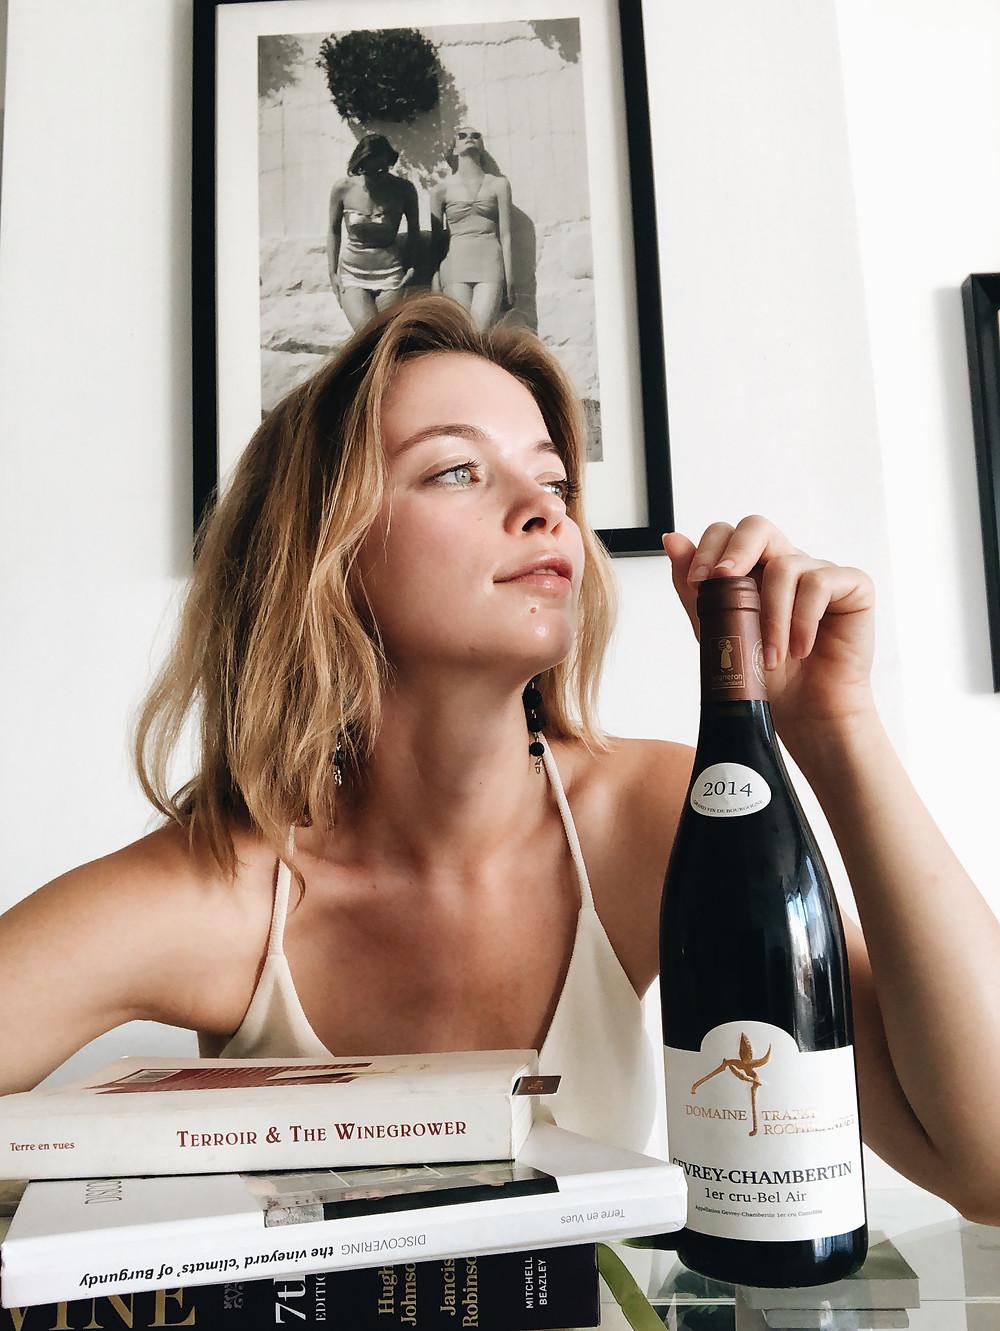 Domaine Trapet-Rochelandet 1er Cru Bel Air wine tasting of Gevrey-Chambertin wines